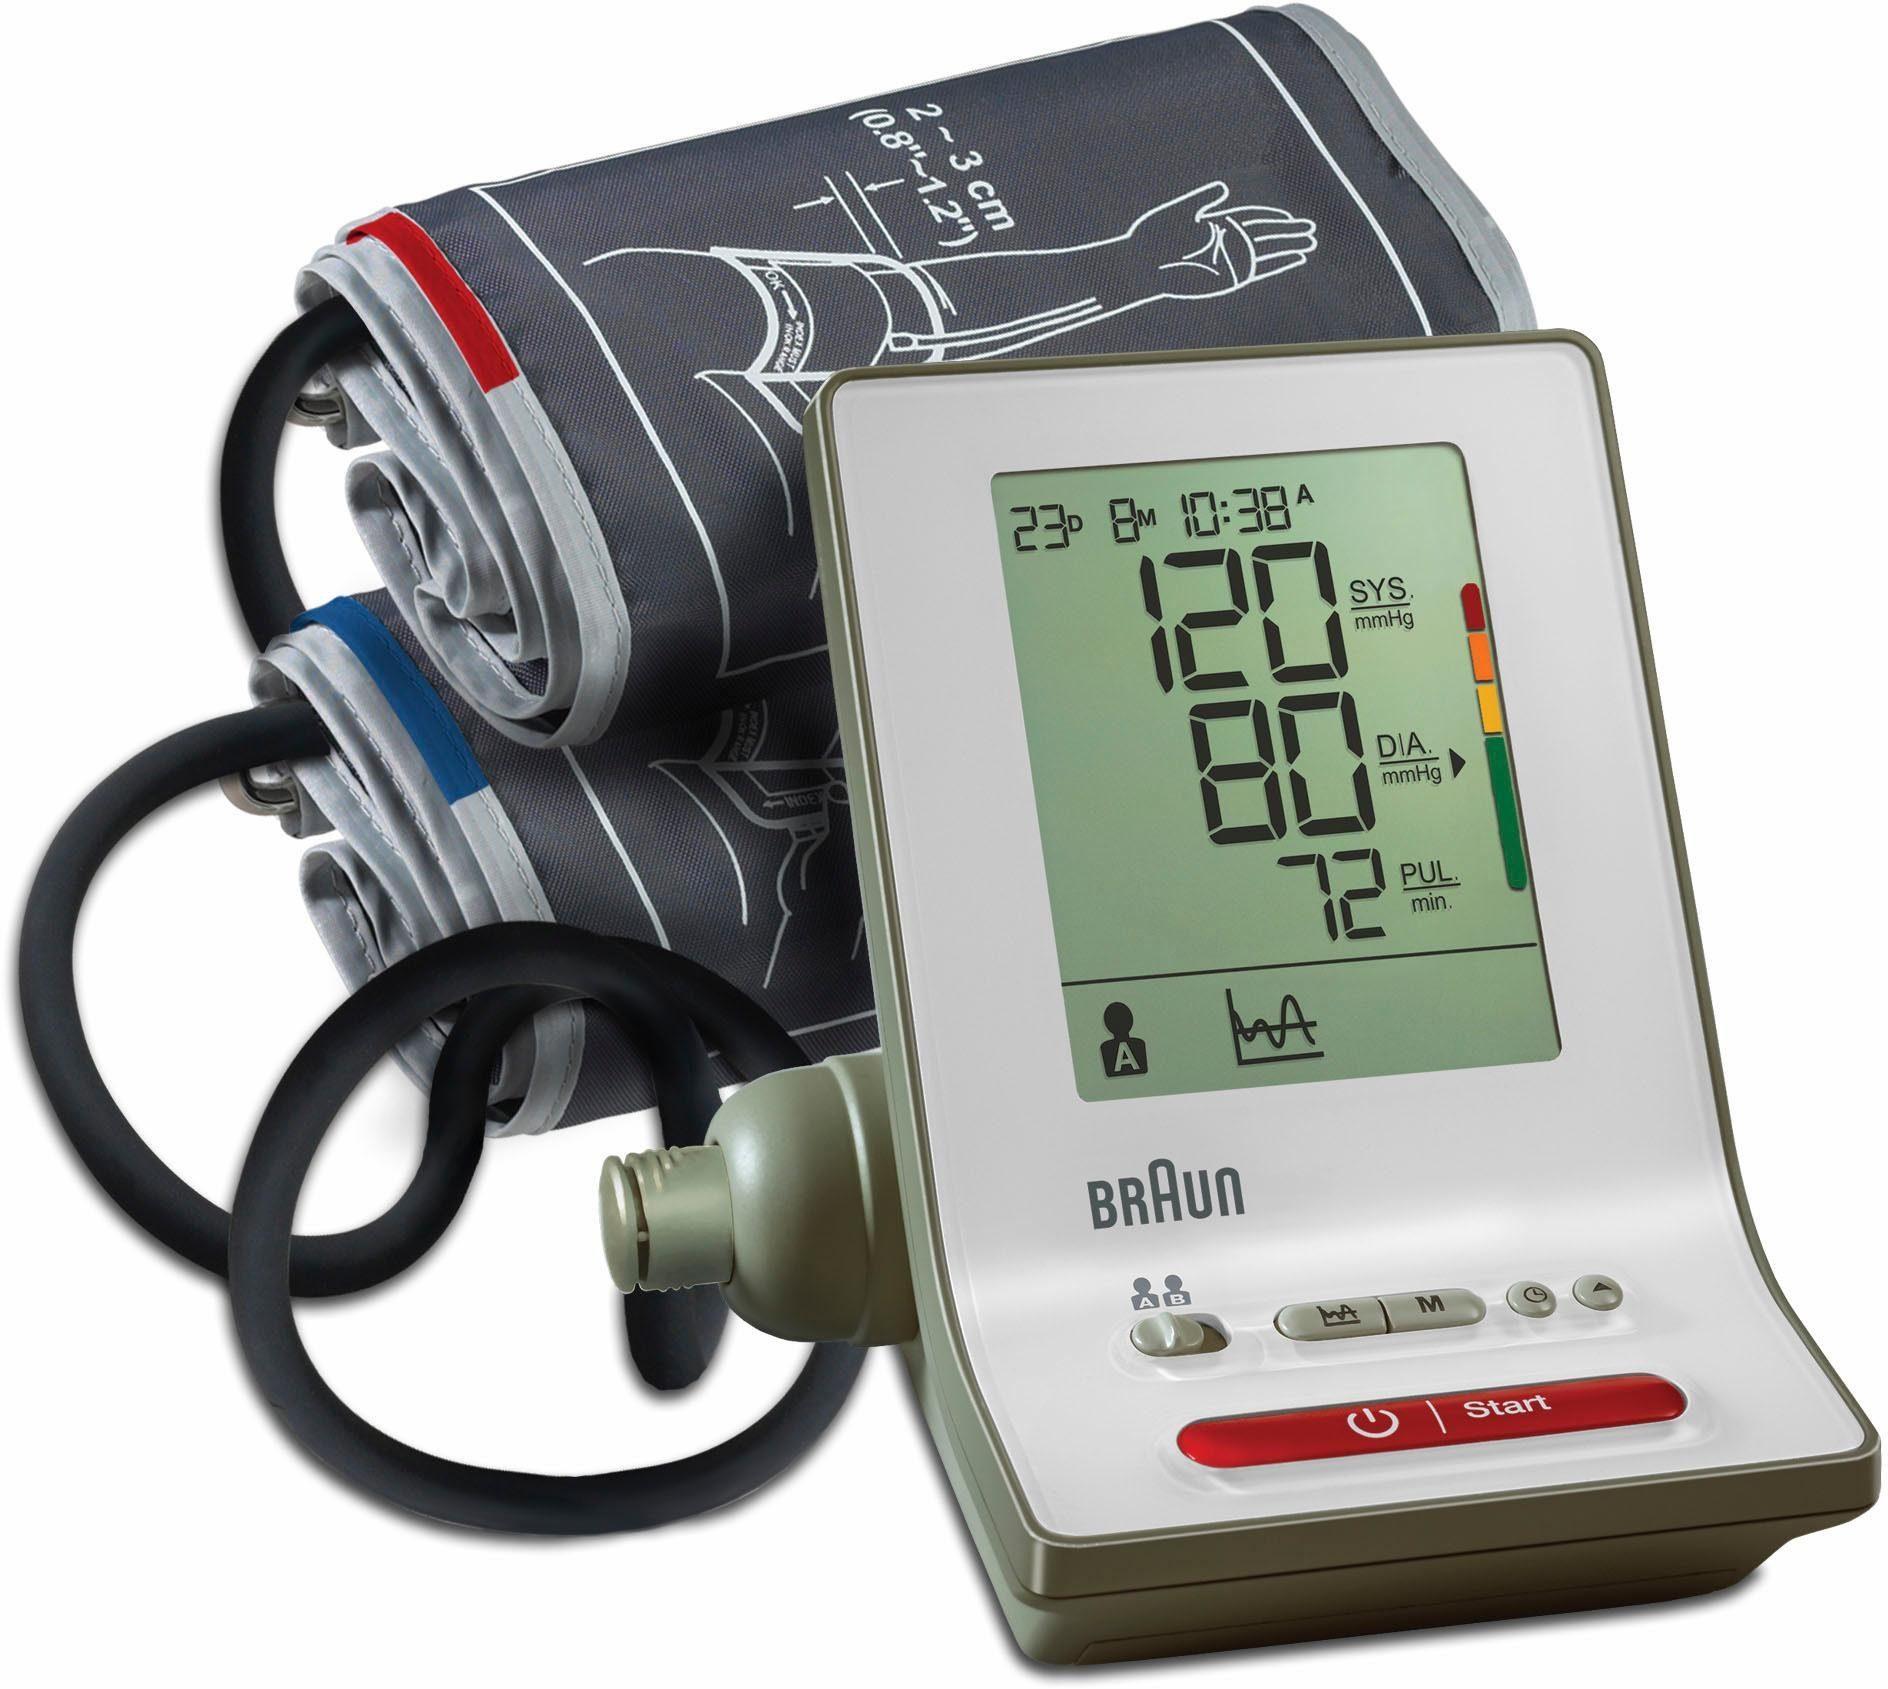 Braun Blutdruckmessgerät ExactFit 3 BP6000